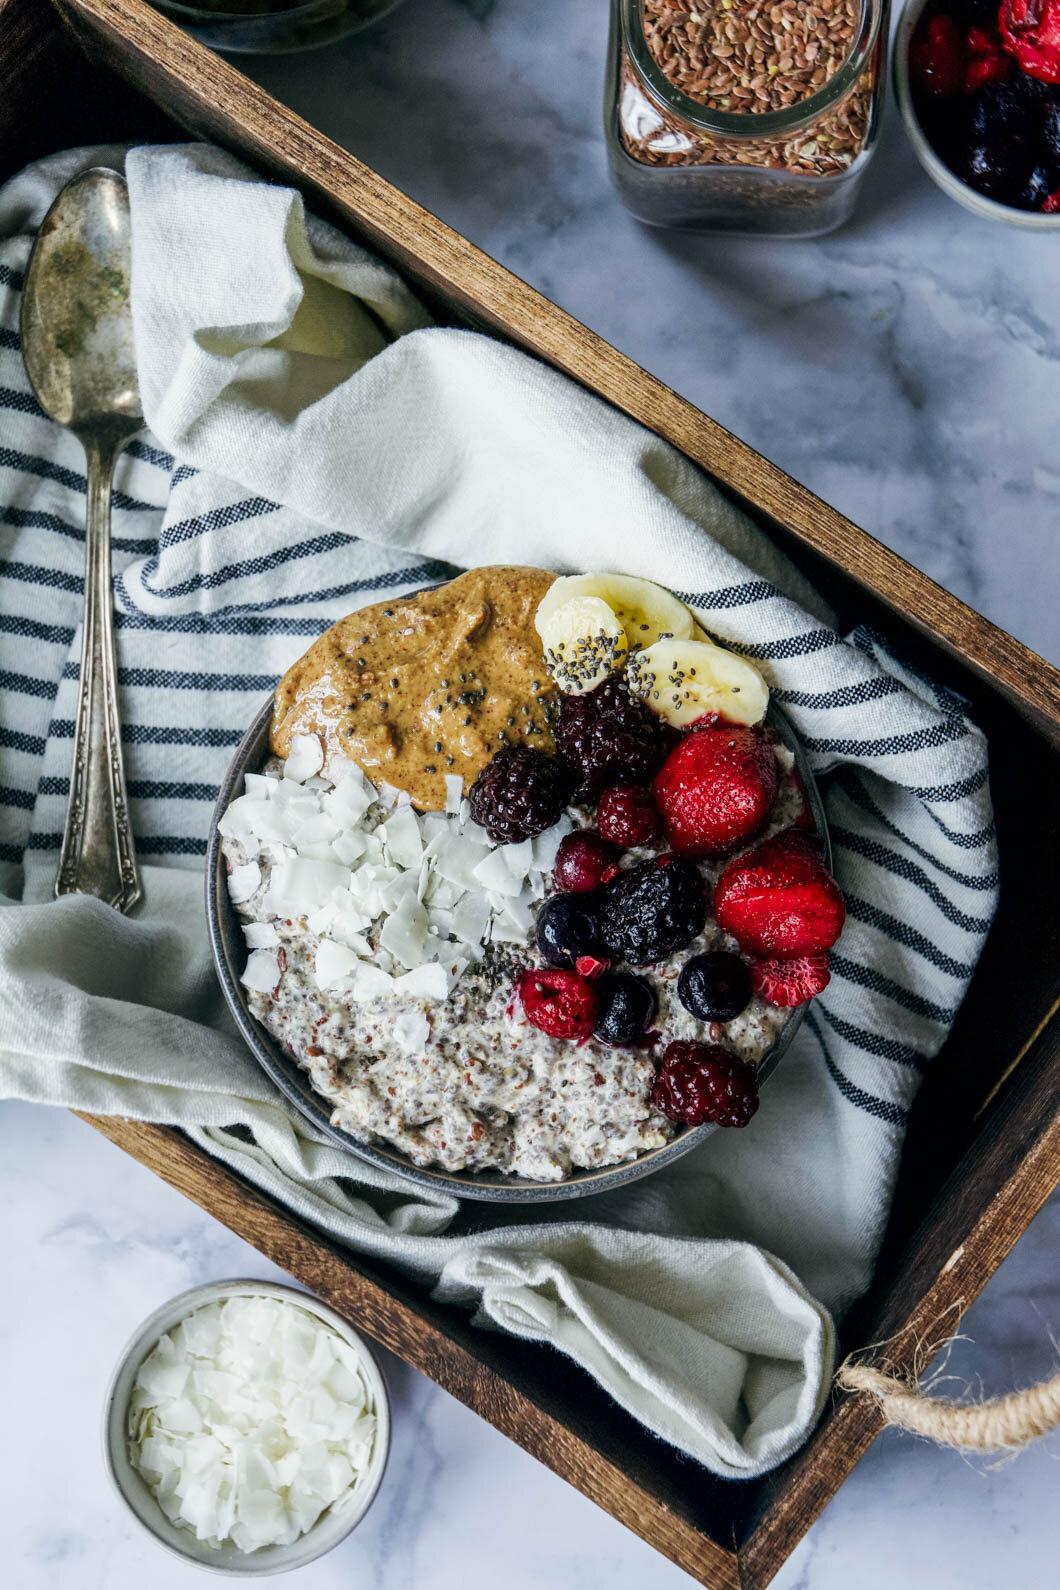 Overnight paleo oatmeal